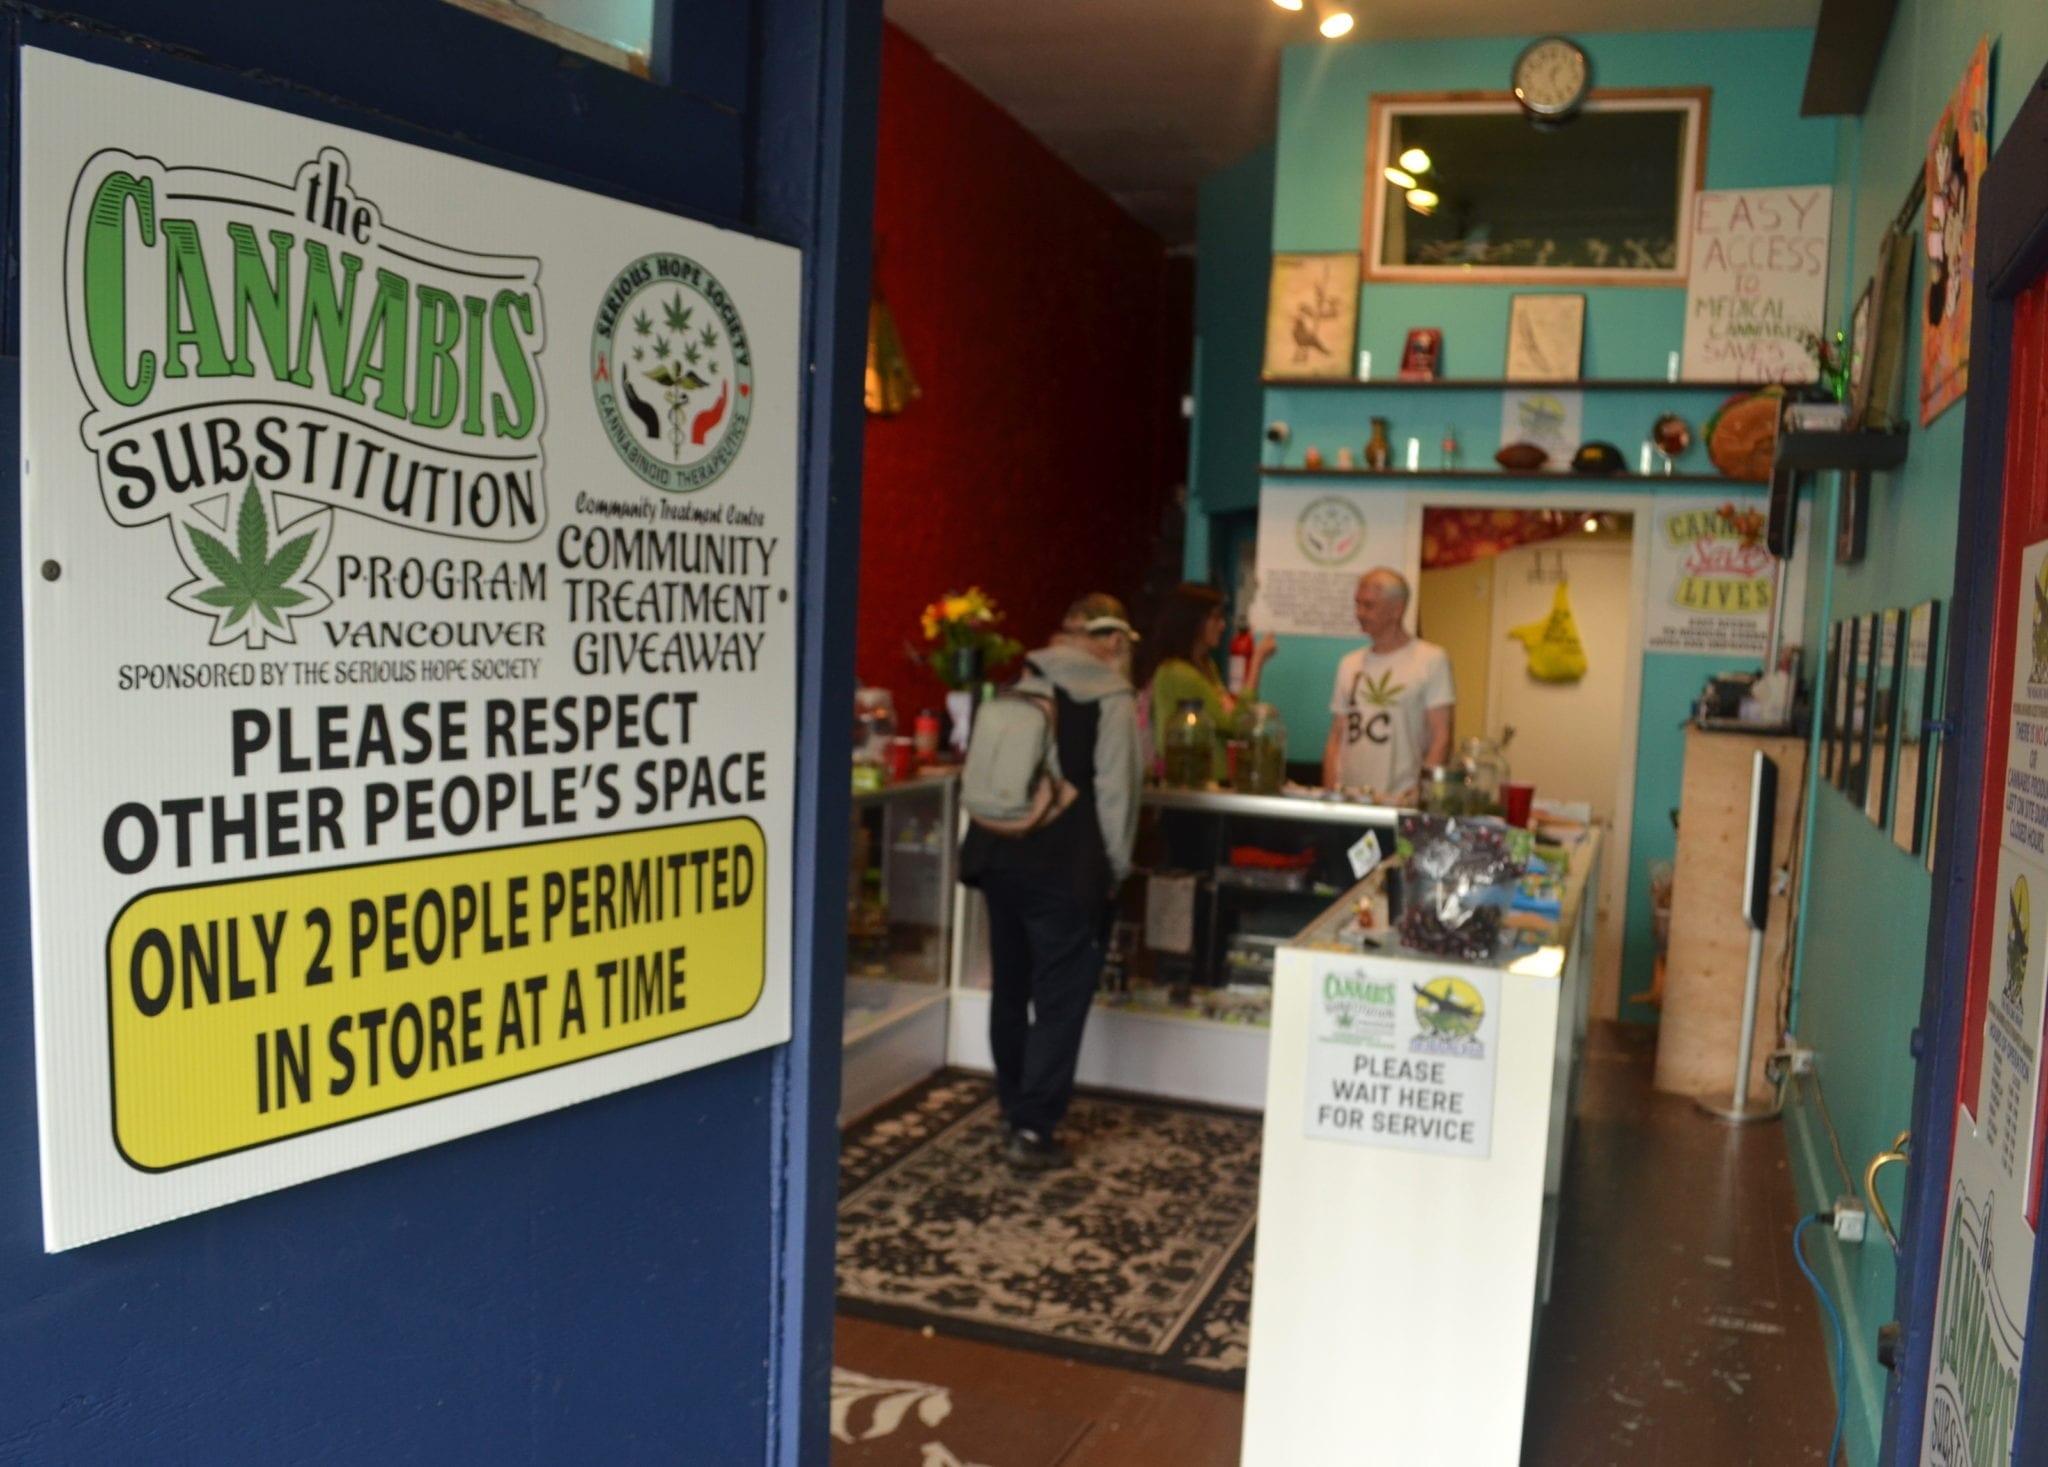 BC health officials lukewarm on cannabis as harm reduction